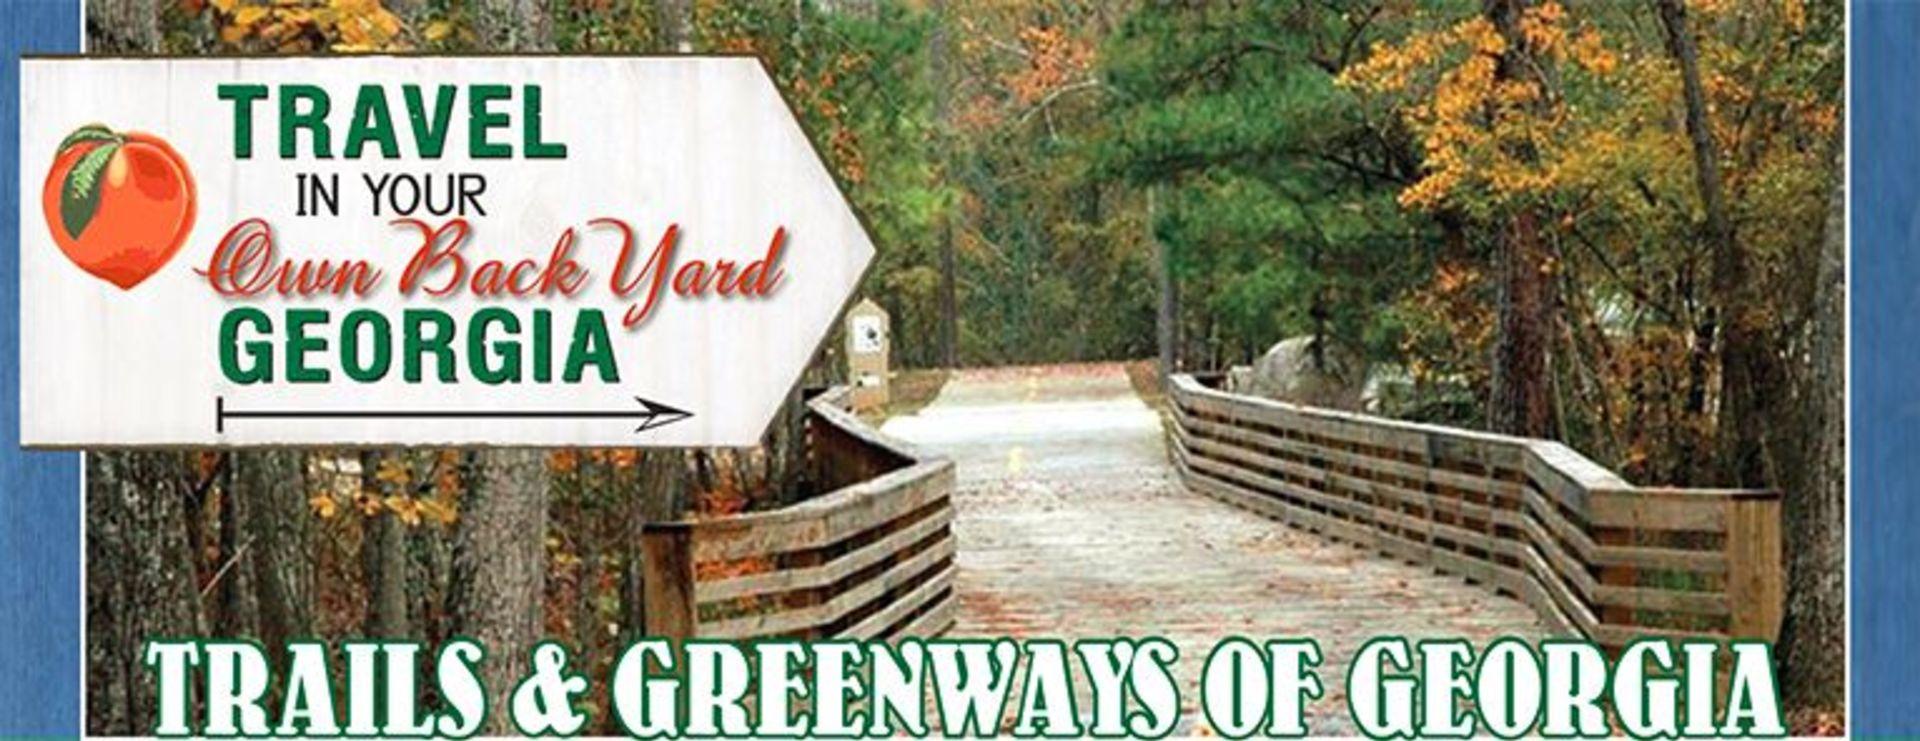 GEORGIA TRAILS & GREENWAYS